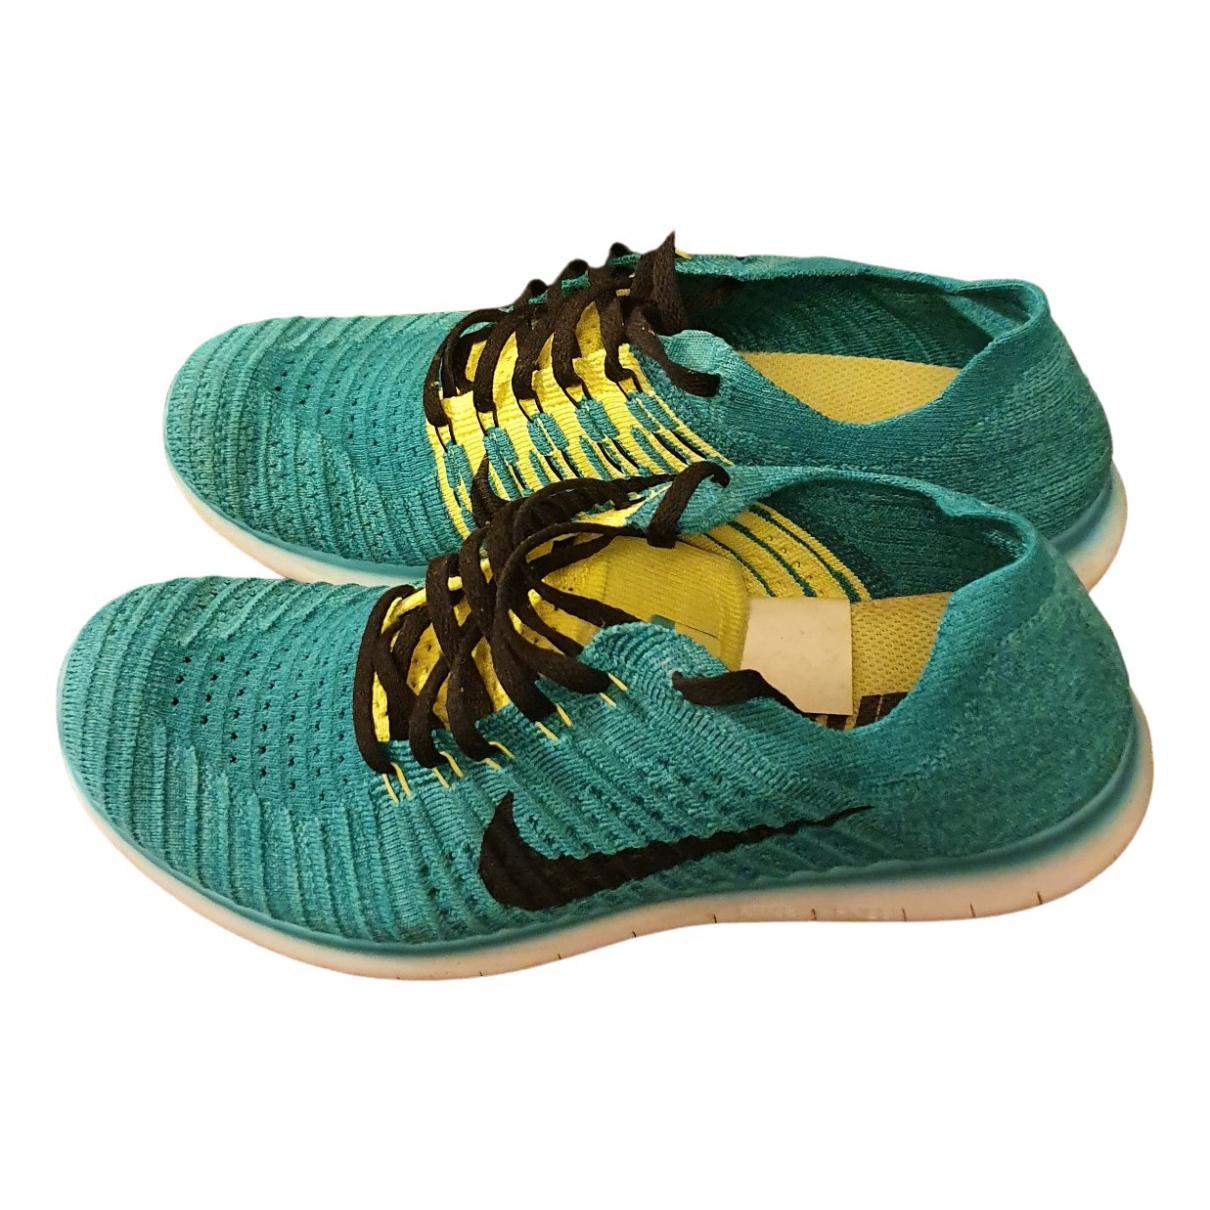 Nike - Baskets Free Run pour homme en toile - vert